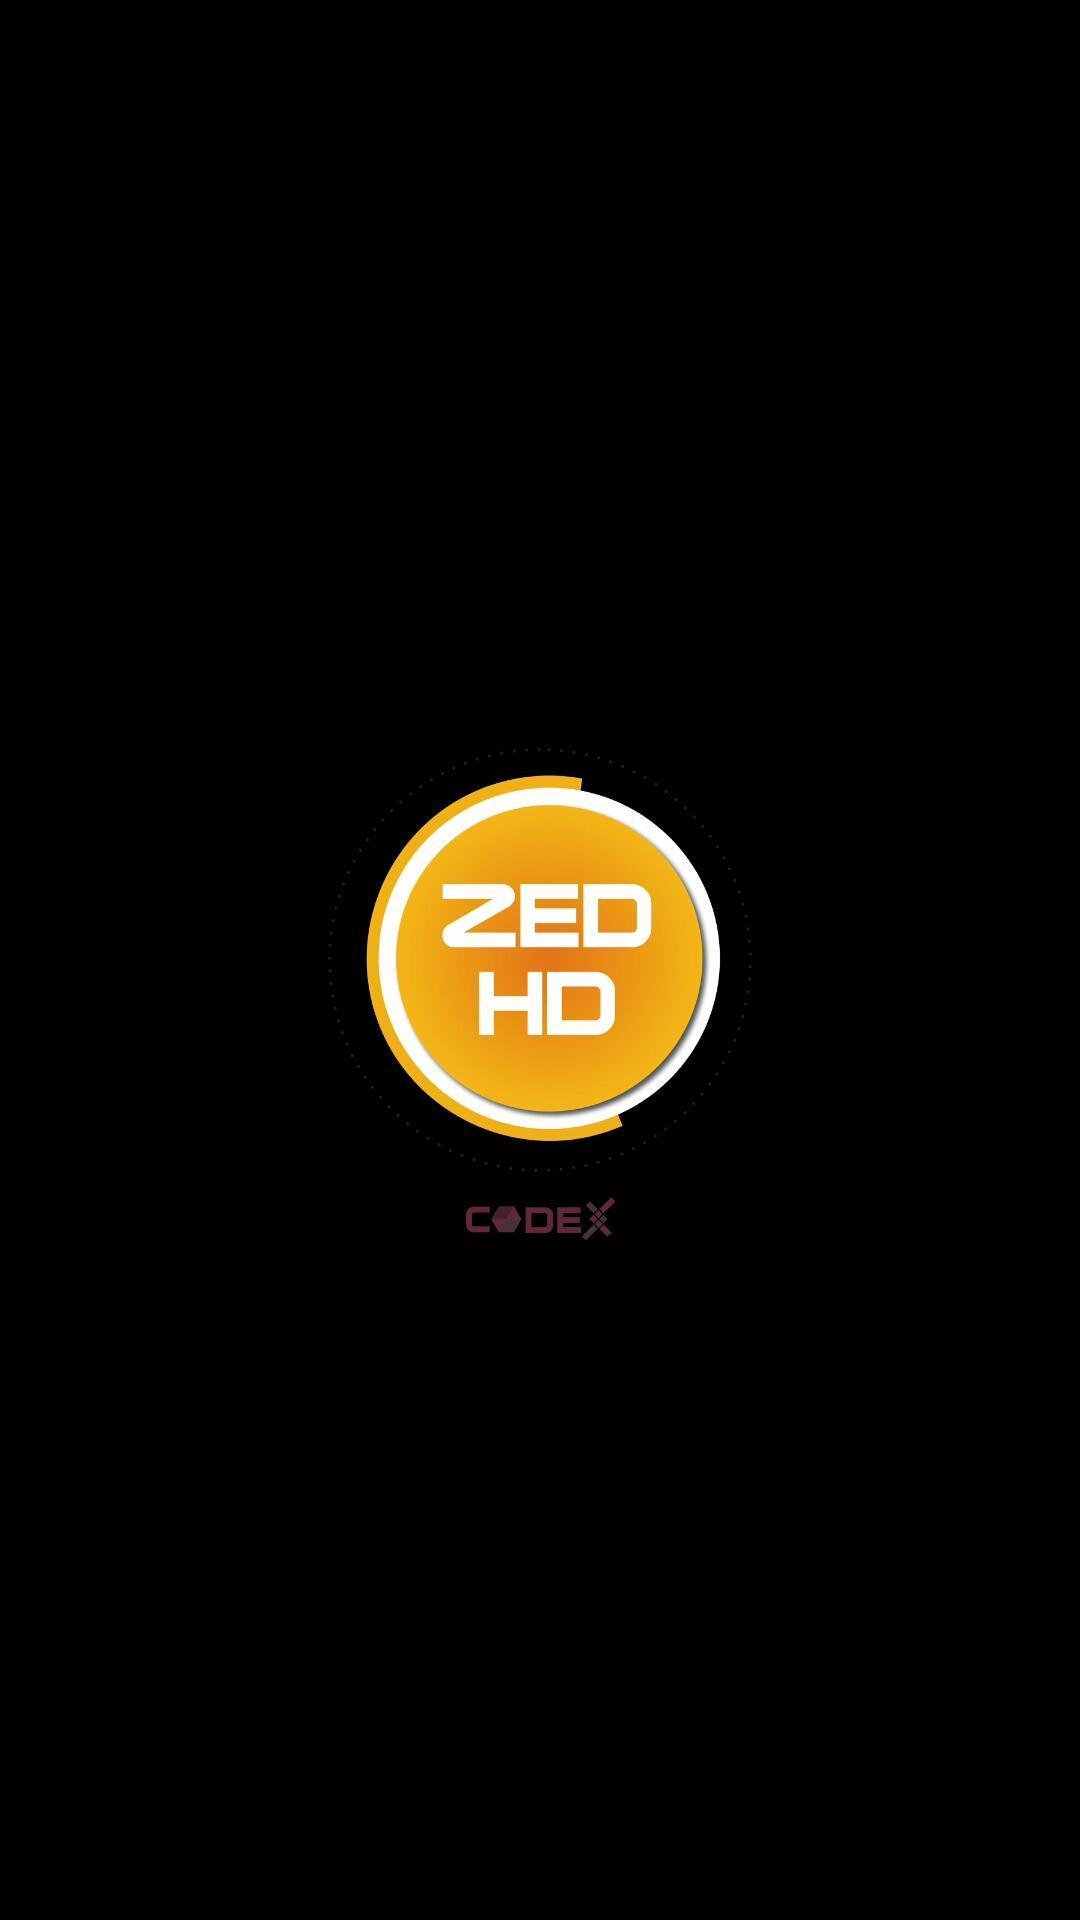 ANDROID TÉLÉCHARGER ZEDTV